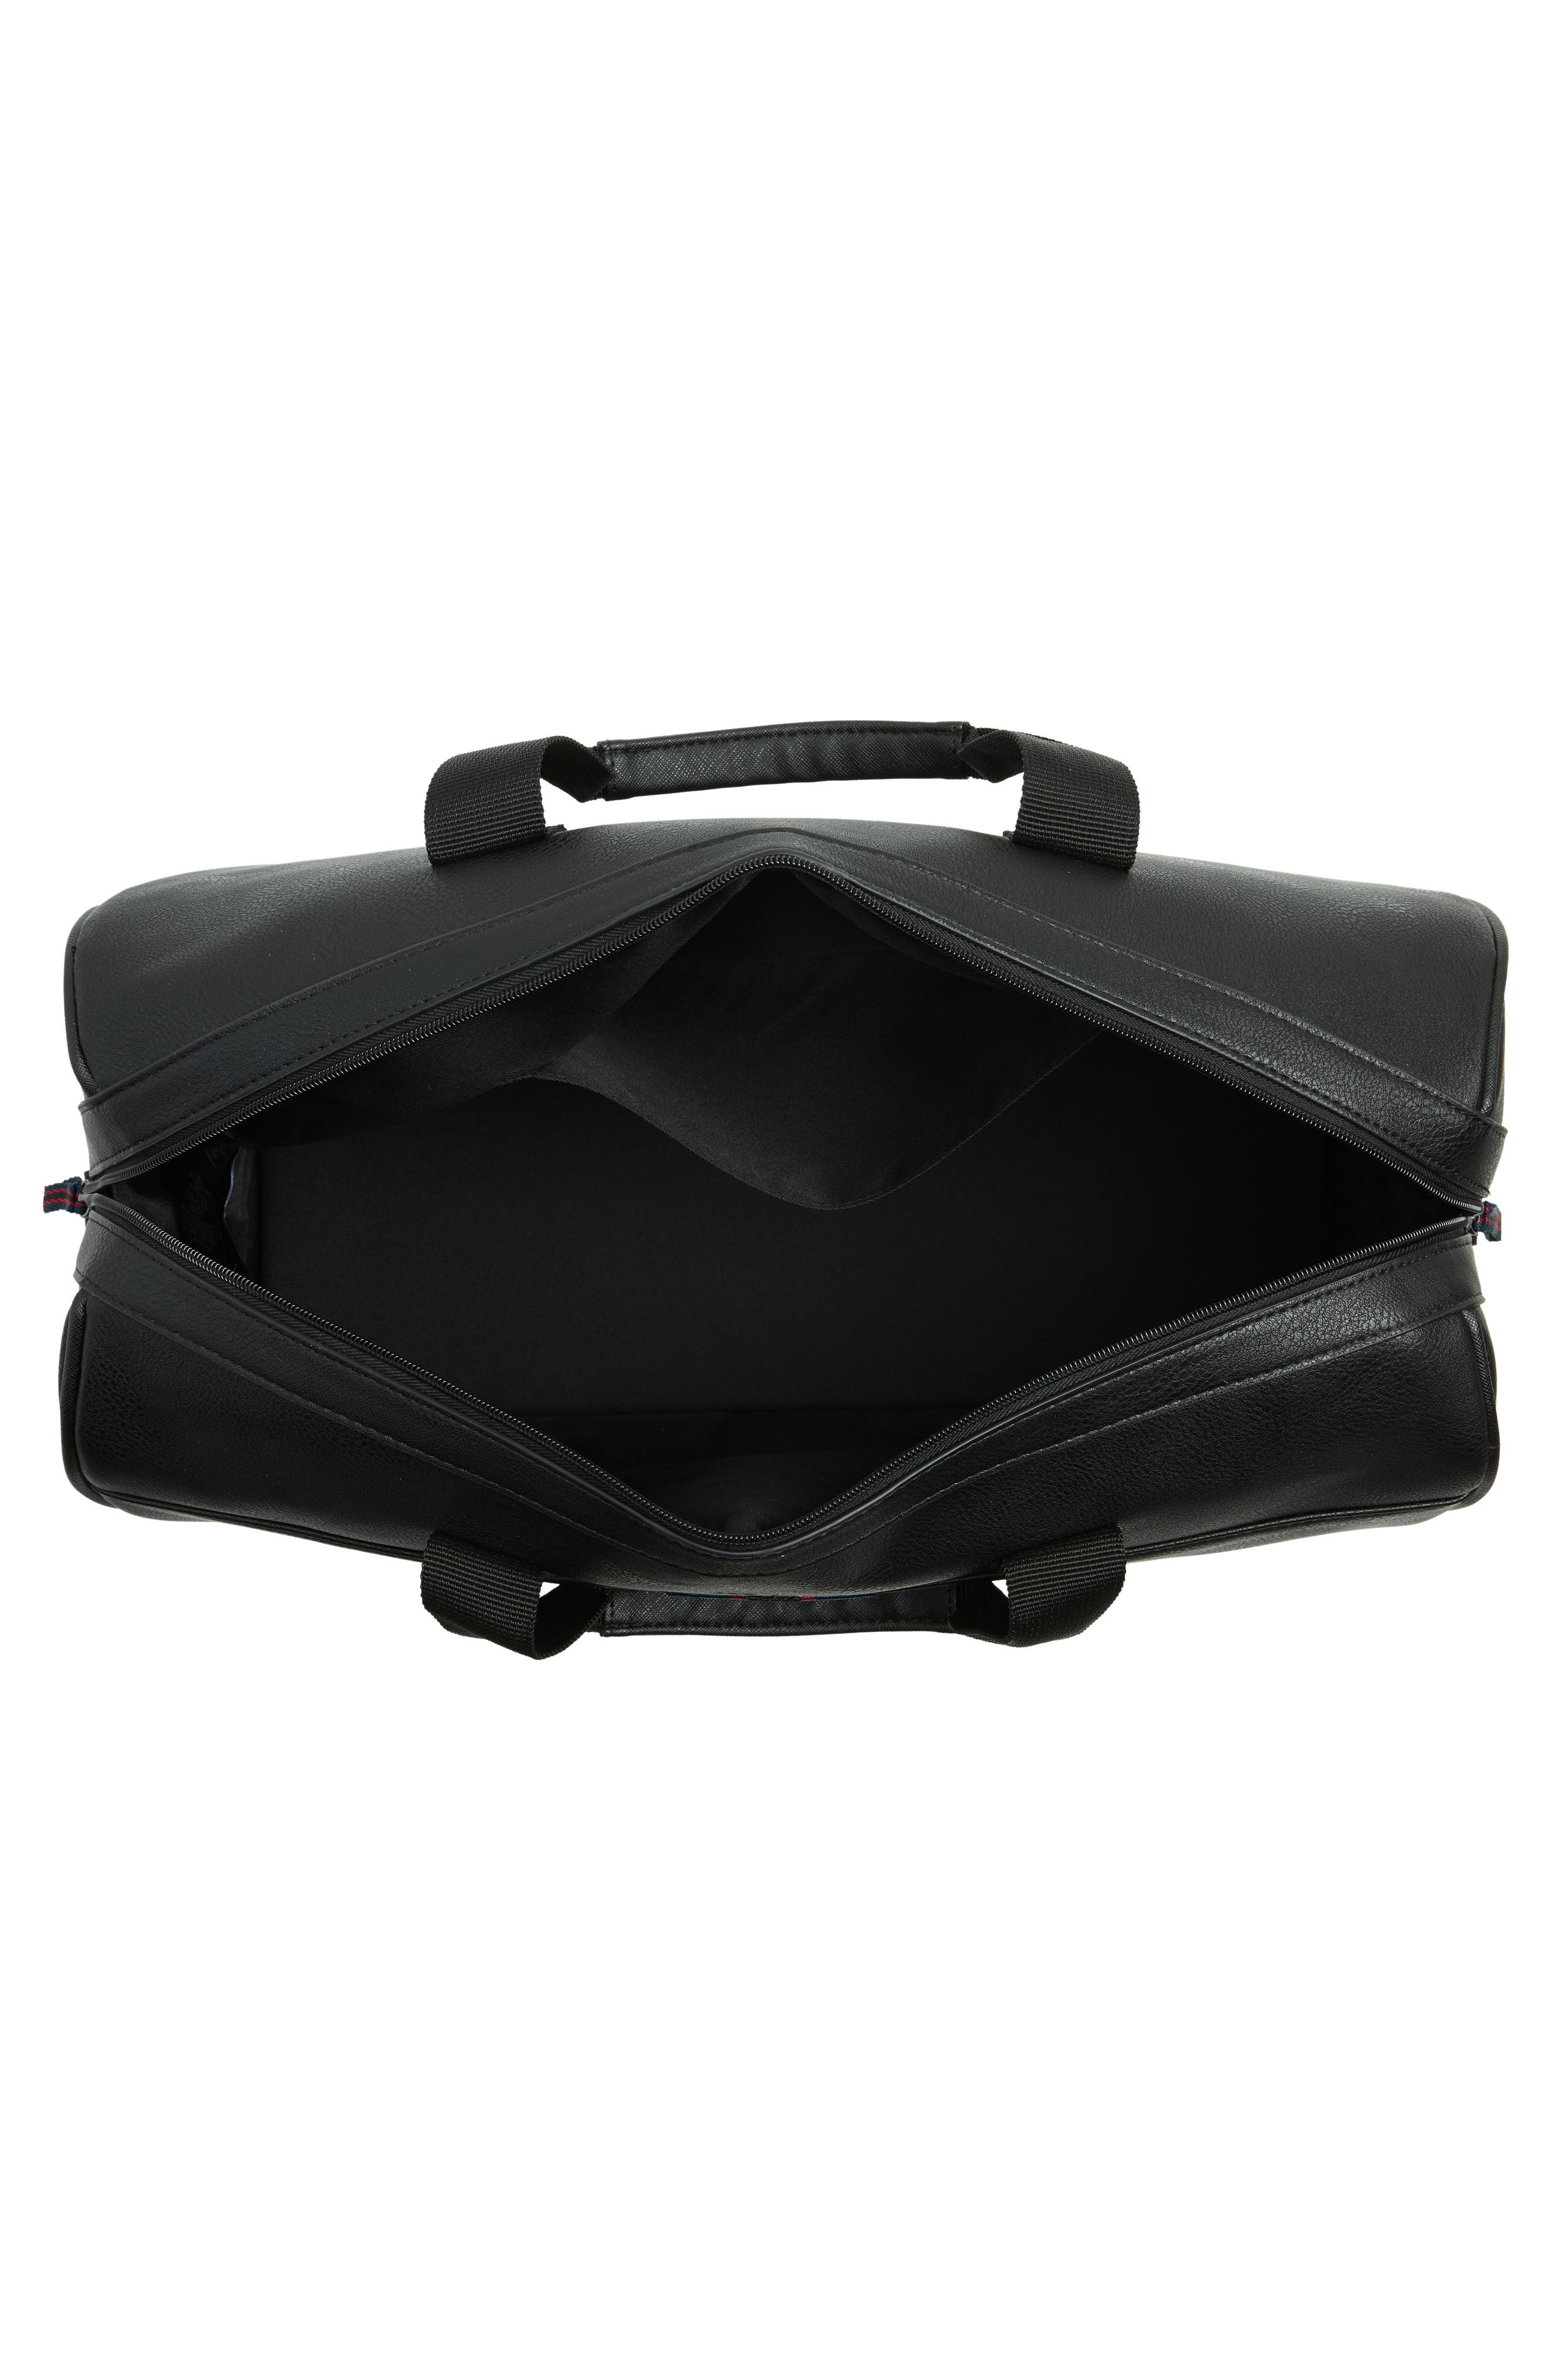 Webbing Duffel Bag,                             Alternate thumbnail 3, color,                             BLACK